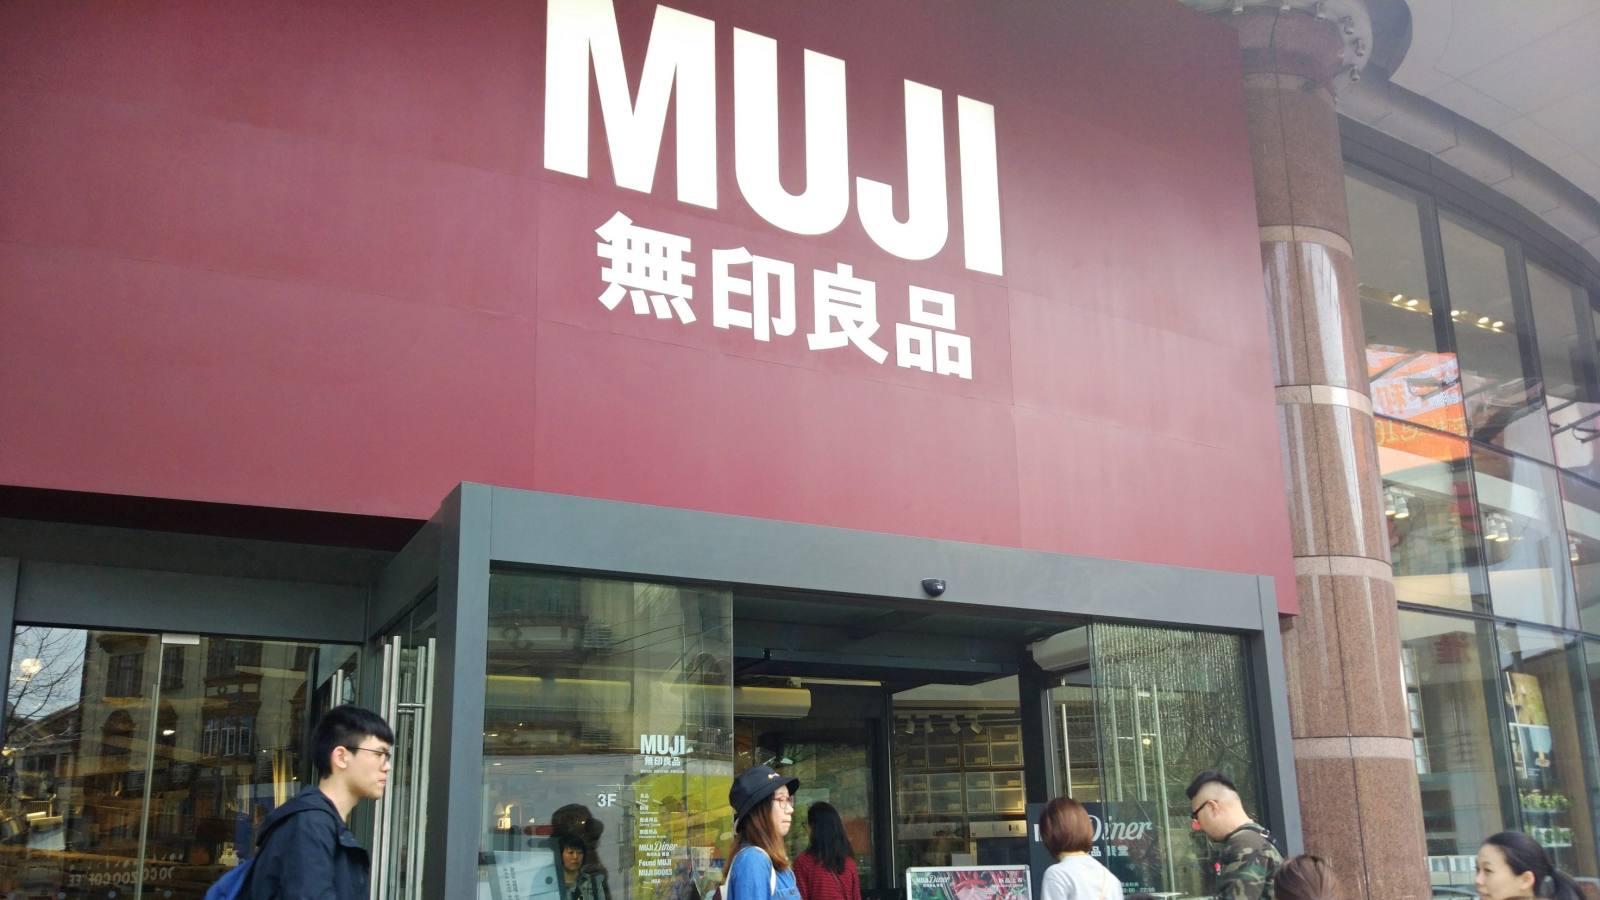 Muji, Japan's 'no brand' brand, battles copycats in China - Nikkei